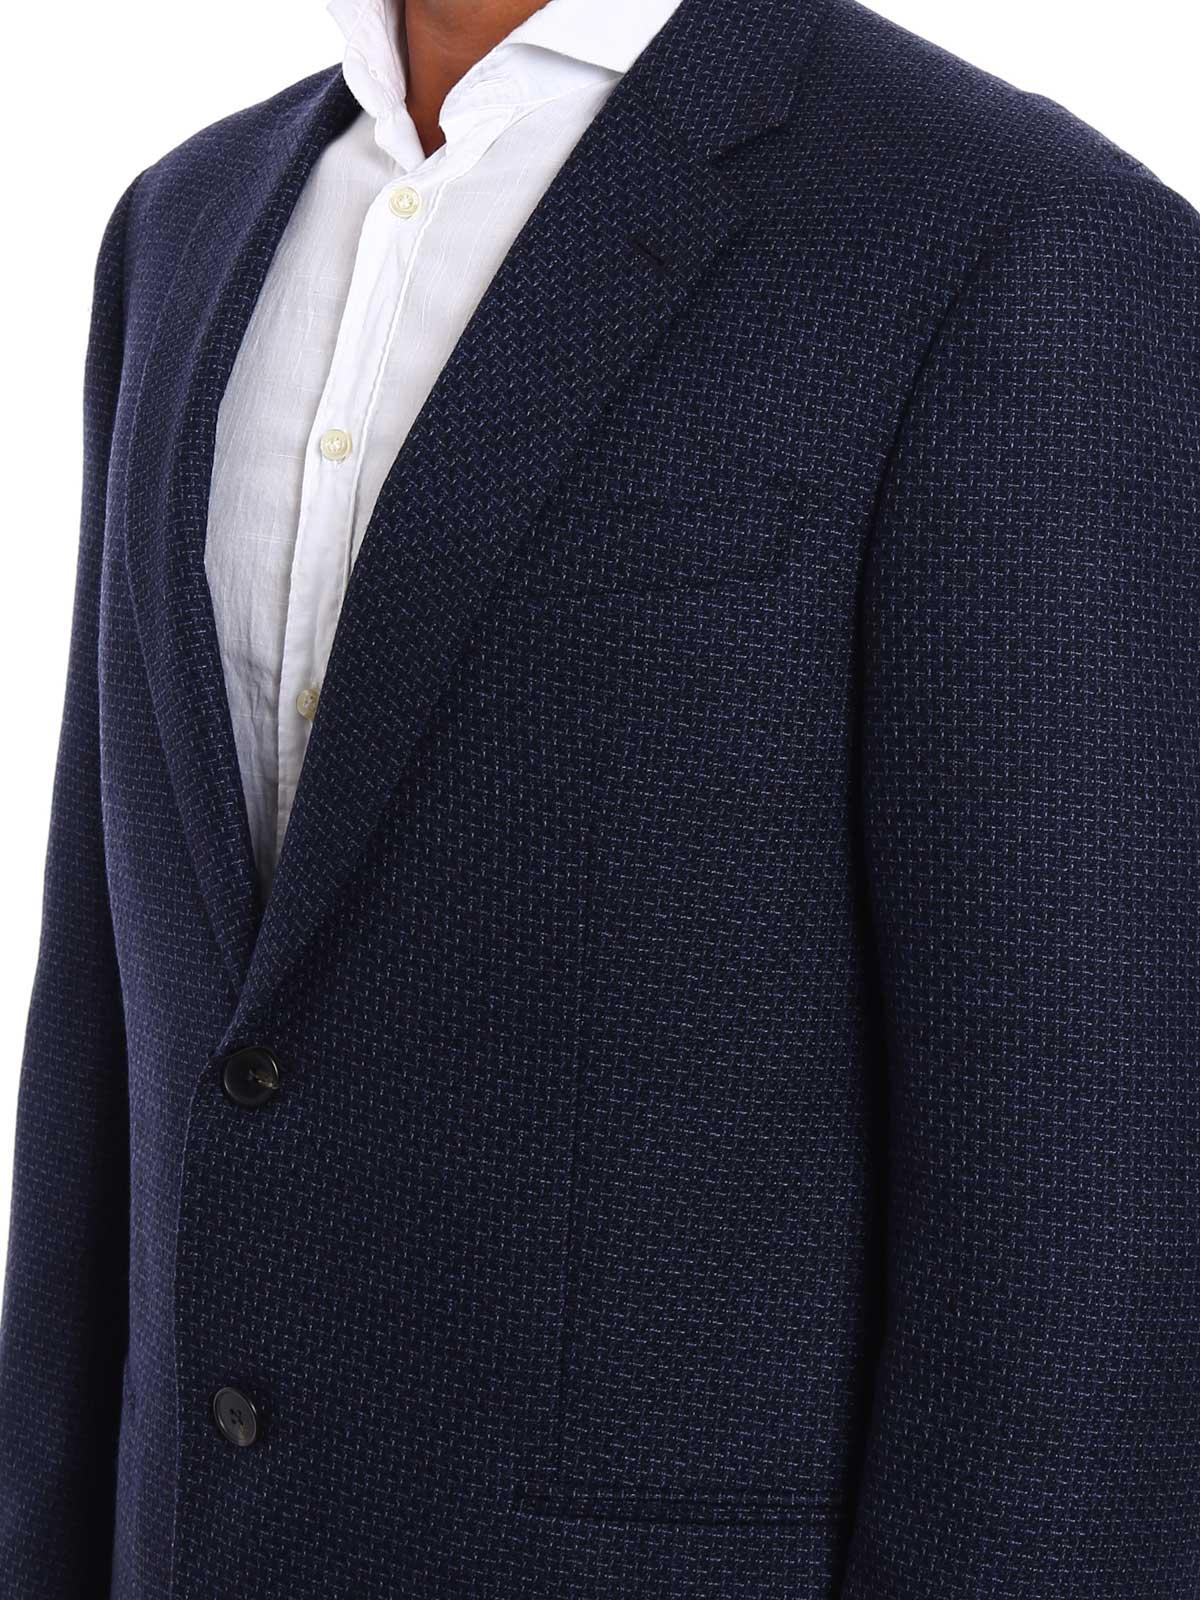 Immagine di ARMANI | Giacche Giacca in lana jacquard